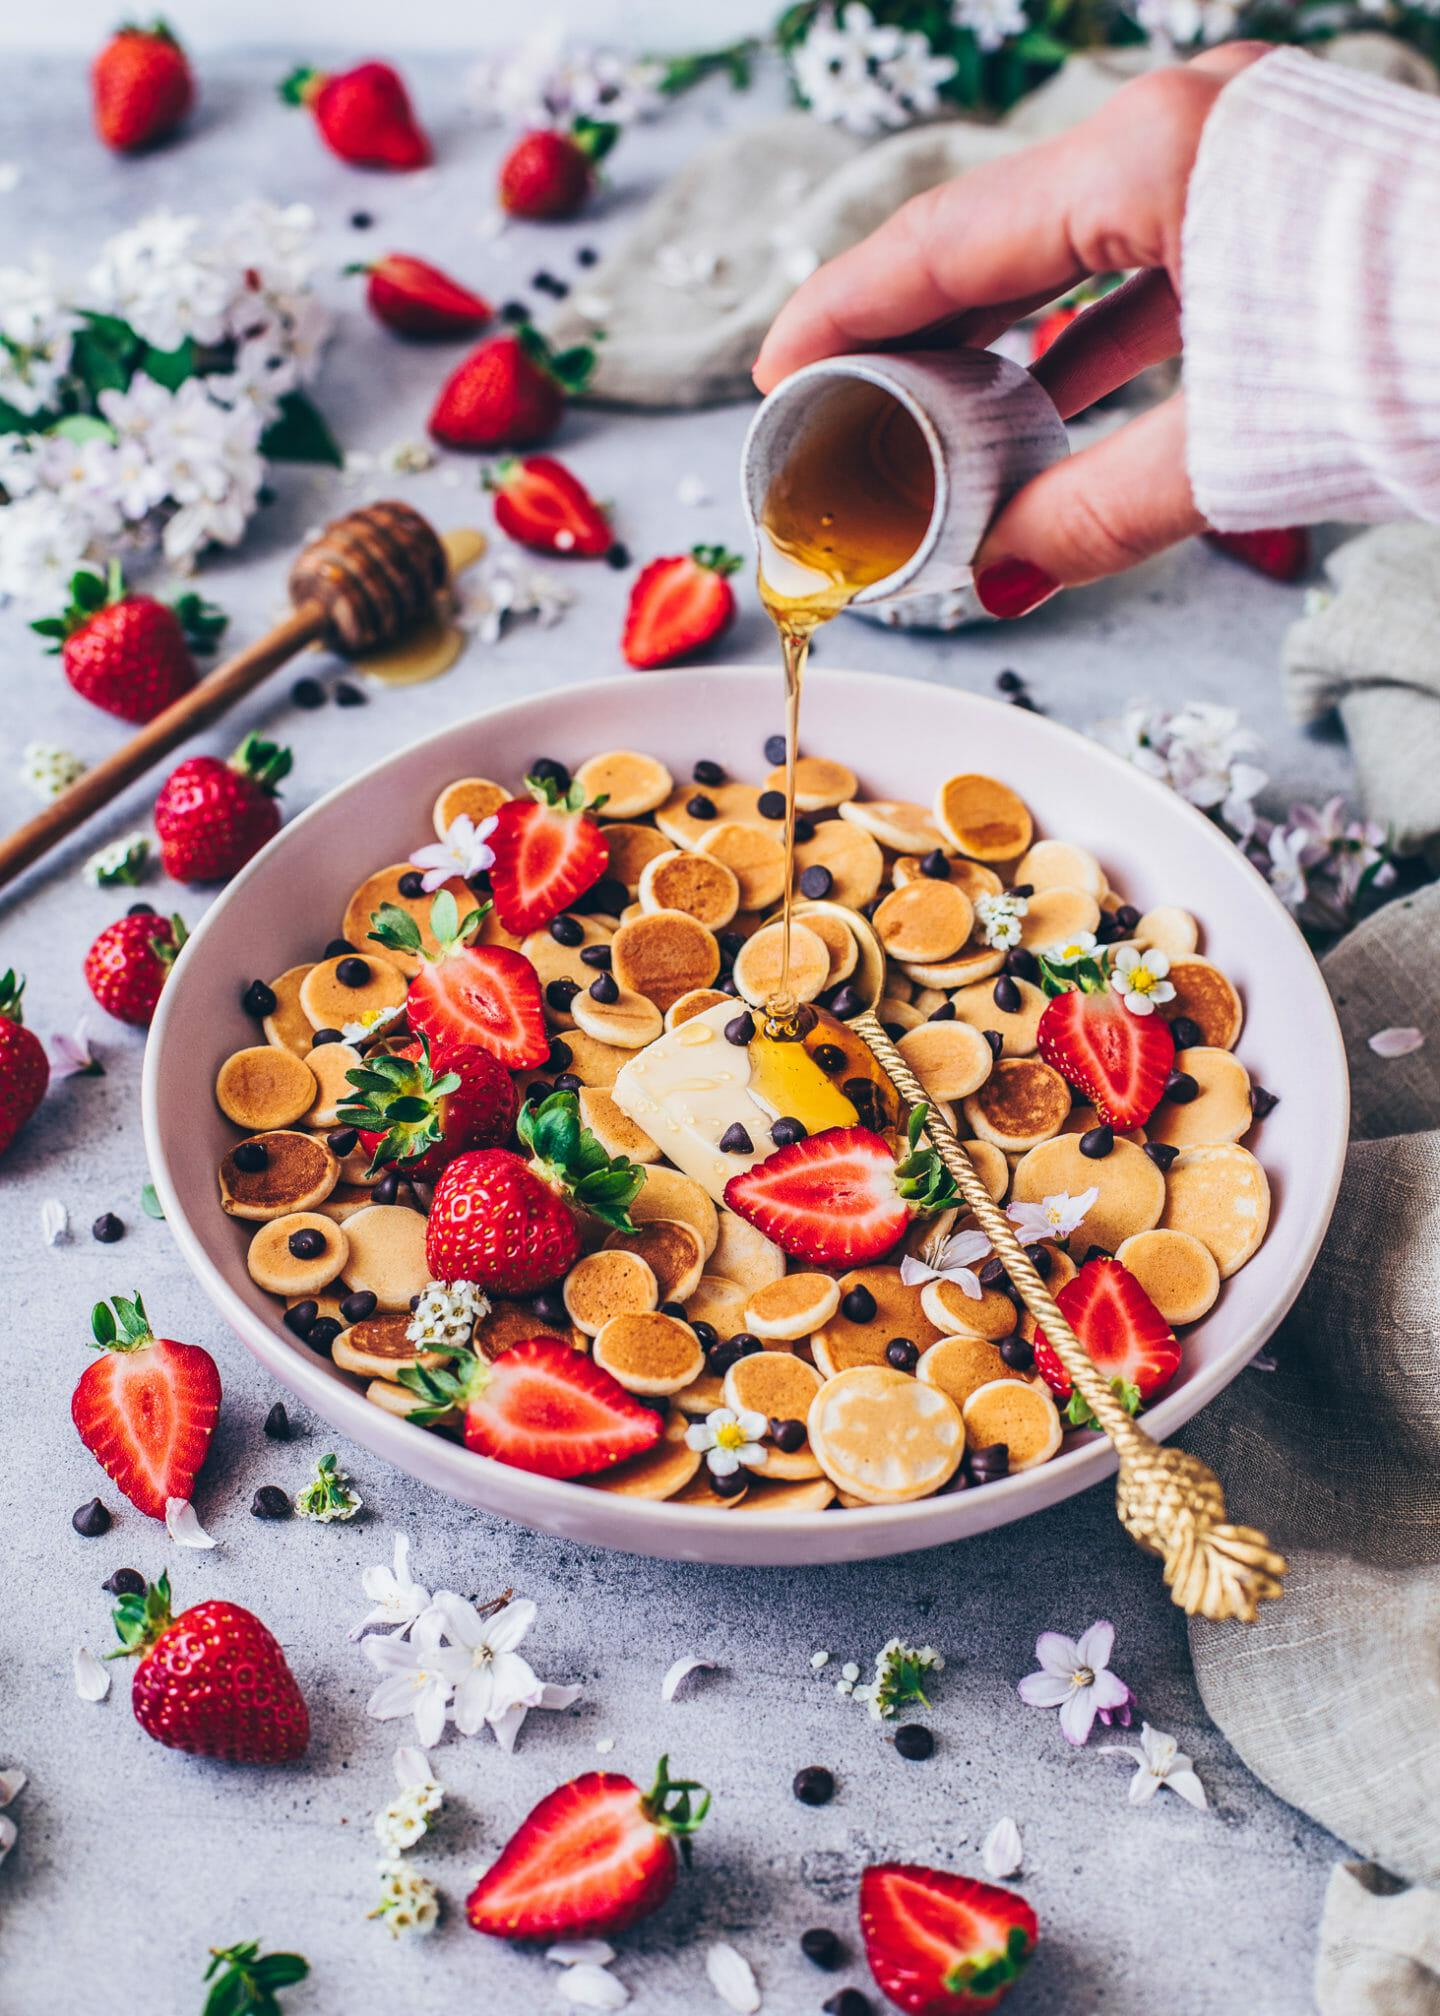 Mini Pfannkuchen (Pancake Cereal Bowl)